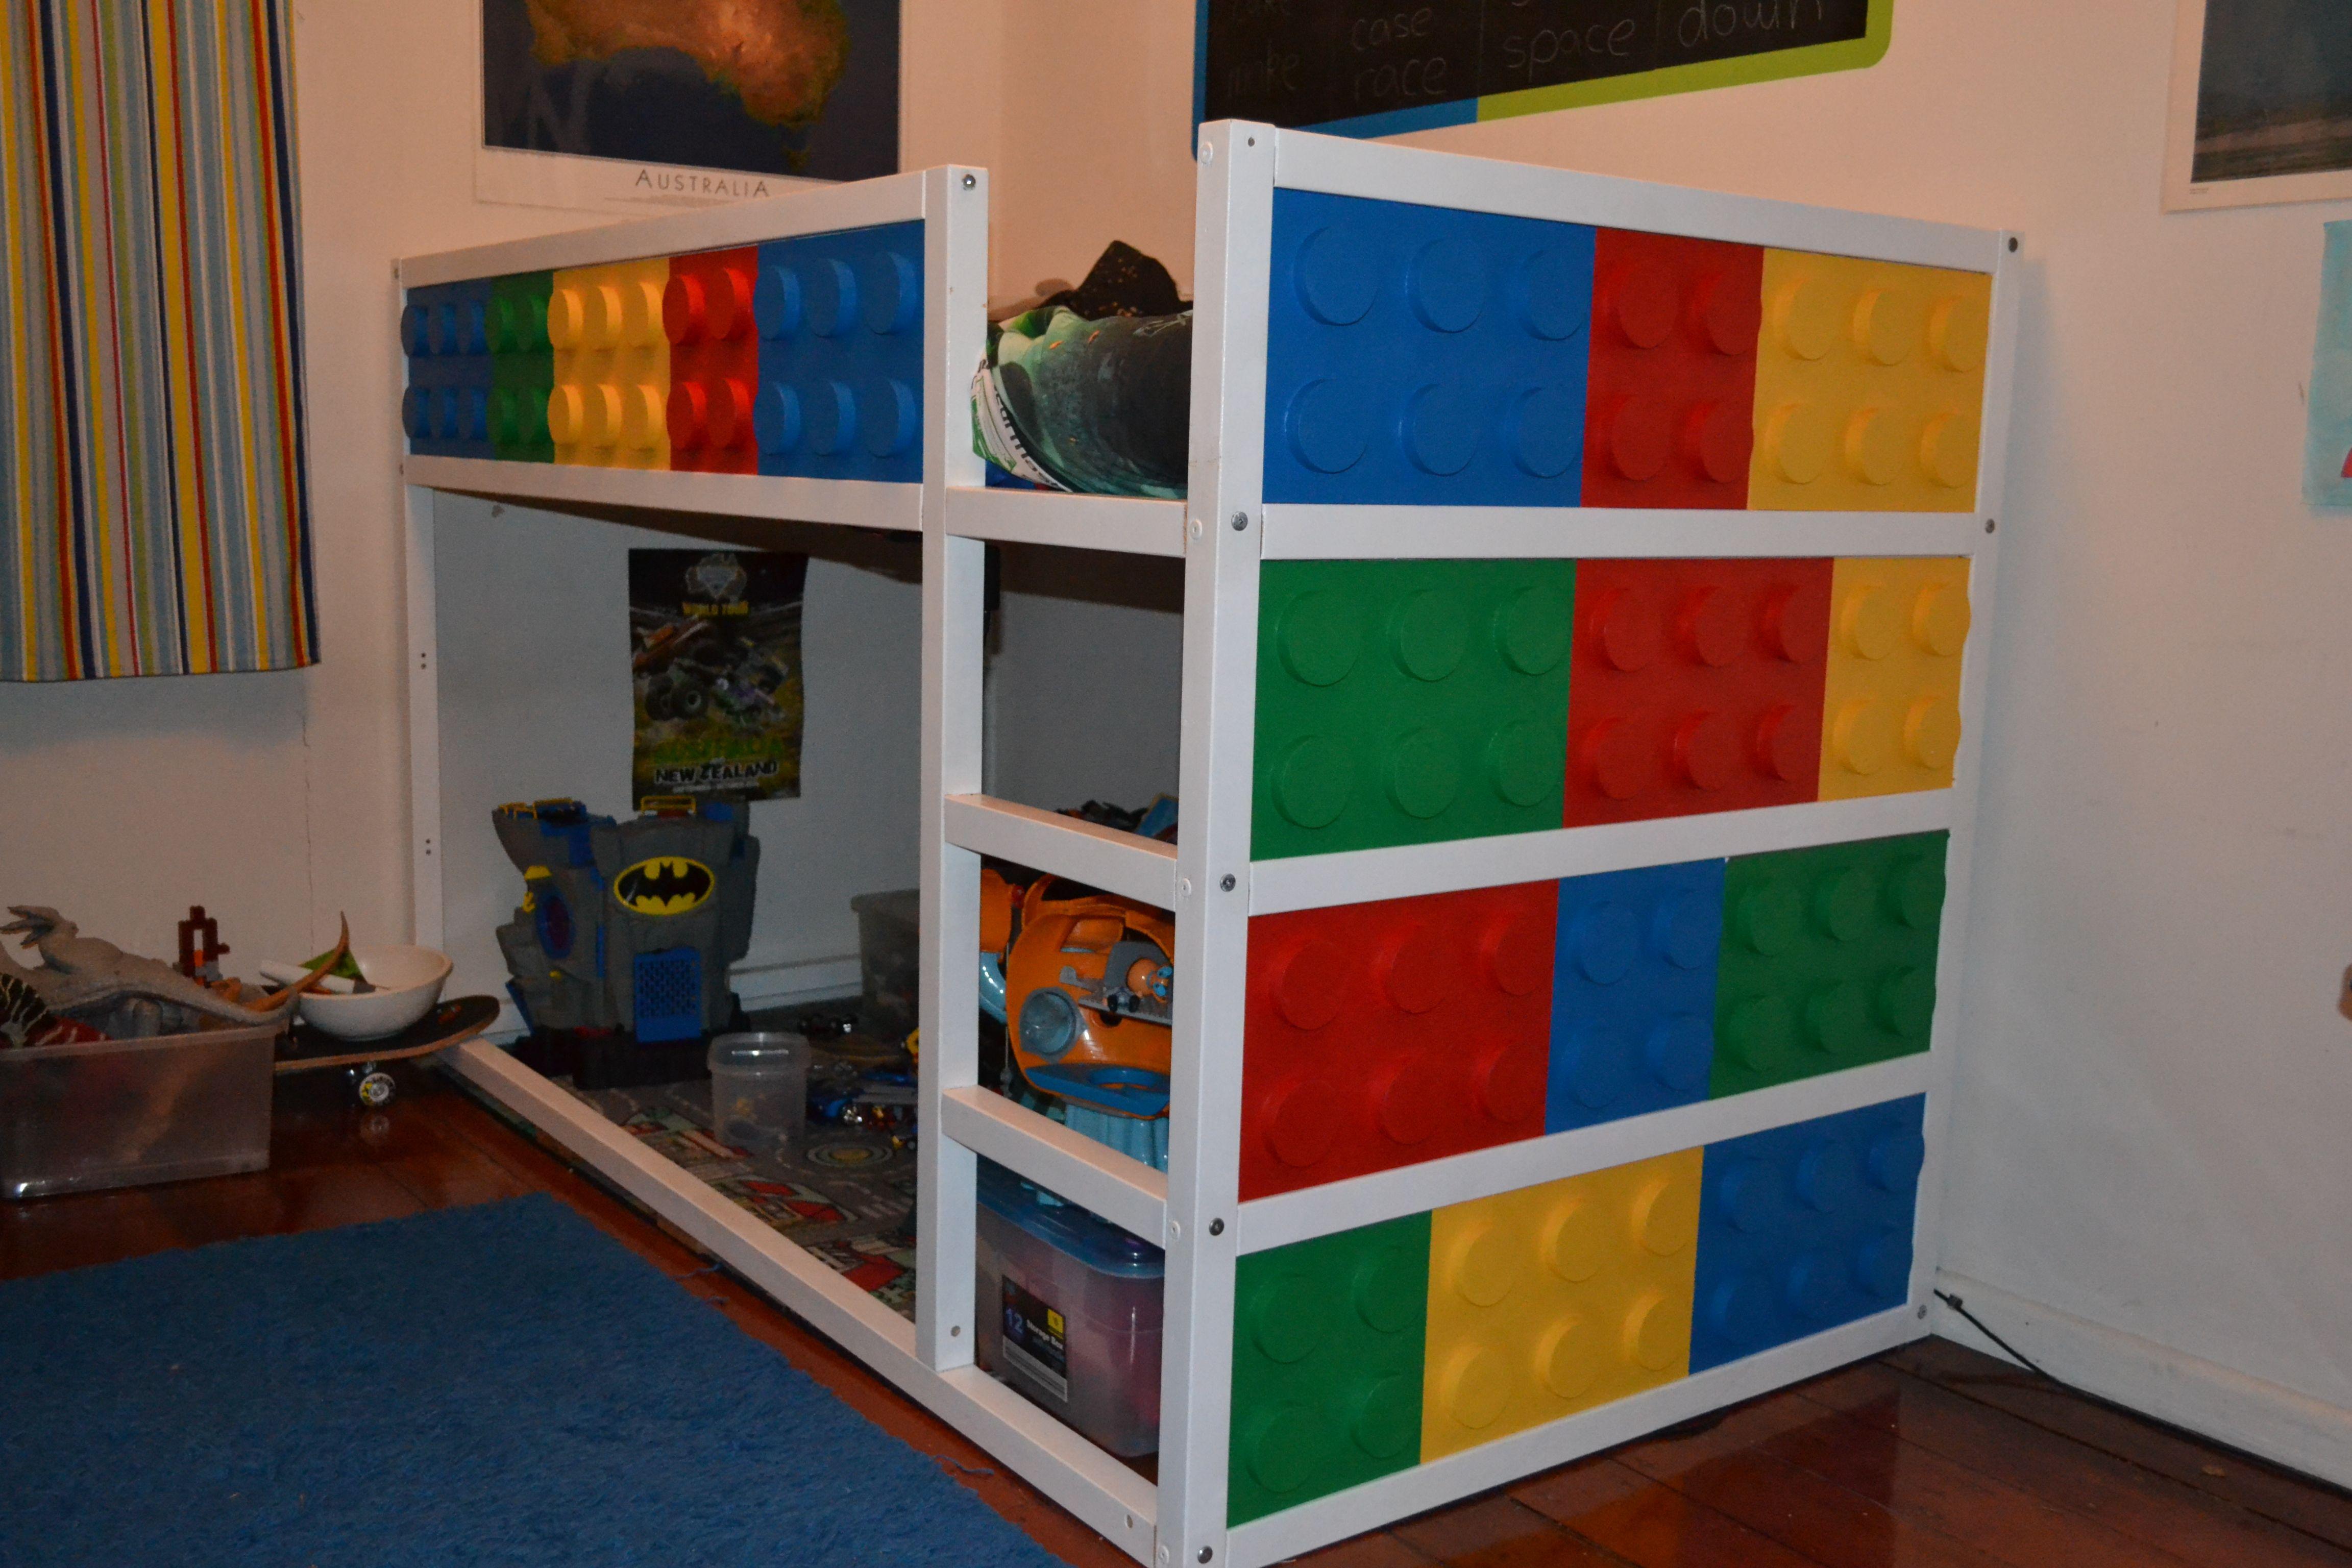 ikea kura bed hack lego bed chambre enfants pinterest lit chambre enfant et chambre. Black Bedroom Furniture Sets. Home Design Ideas